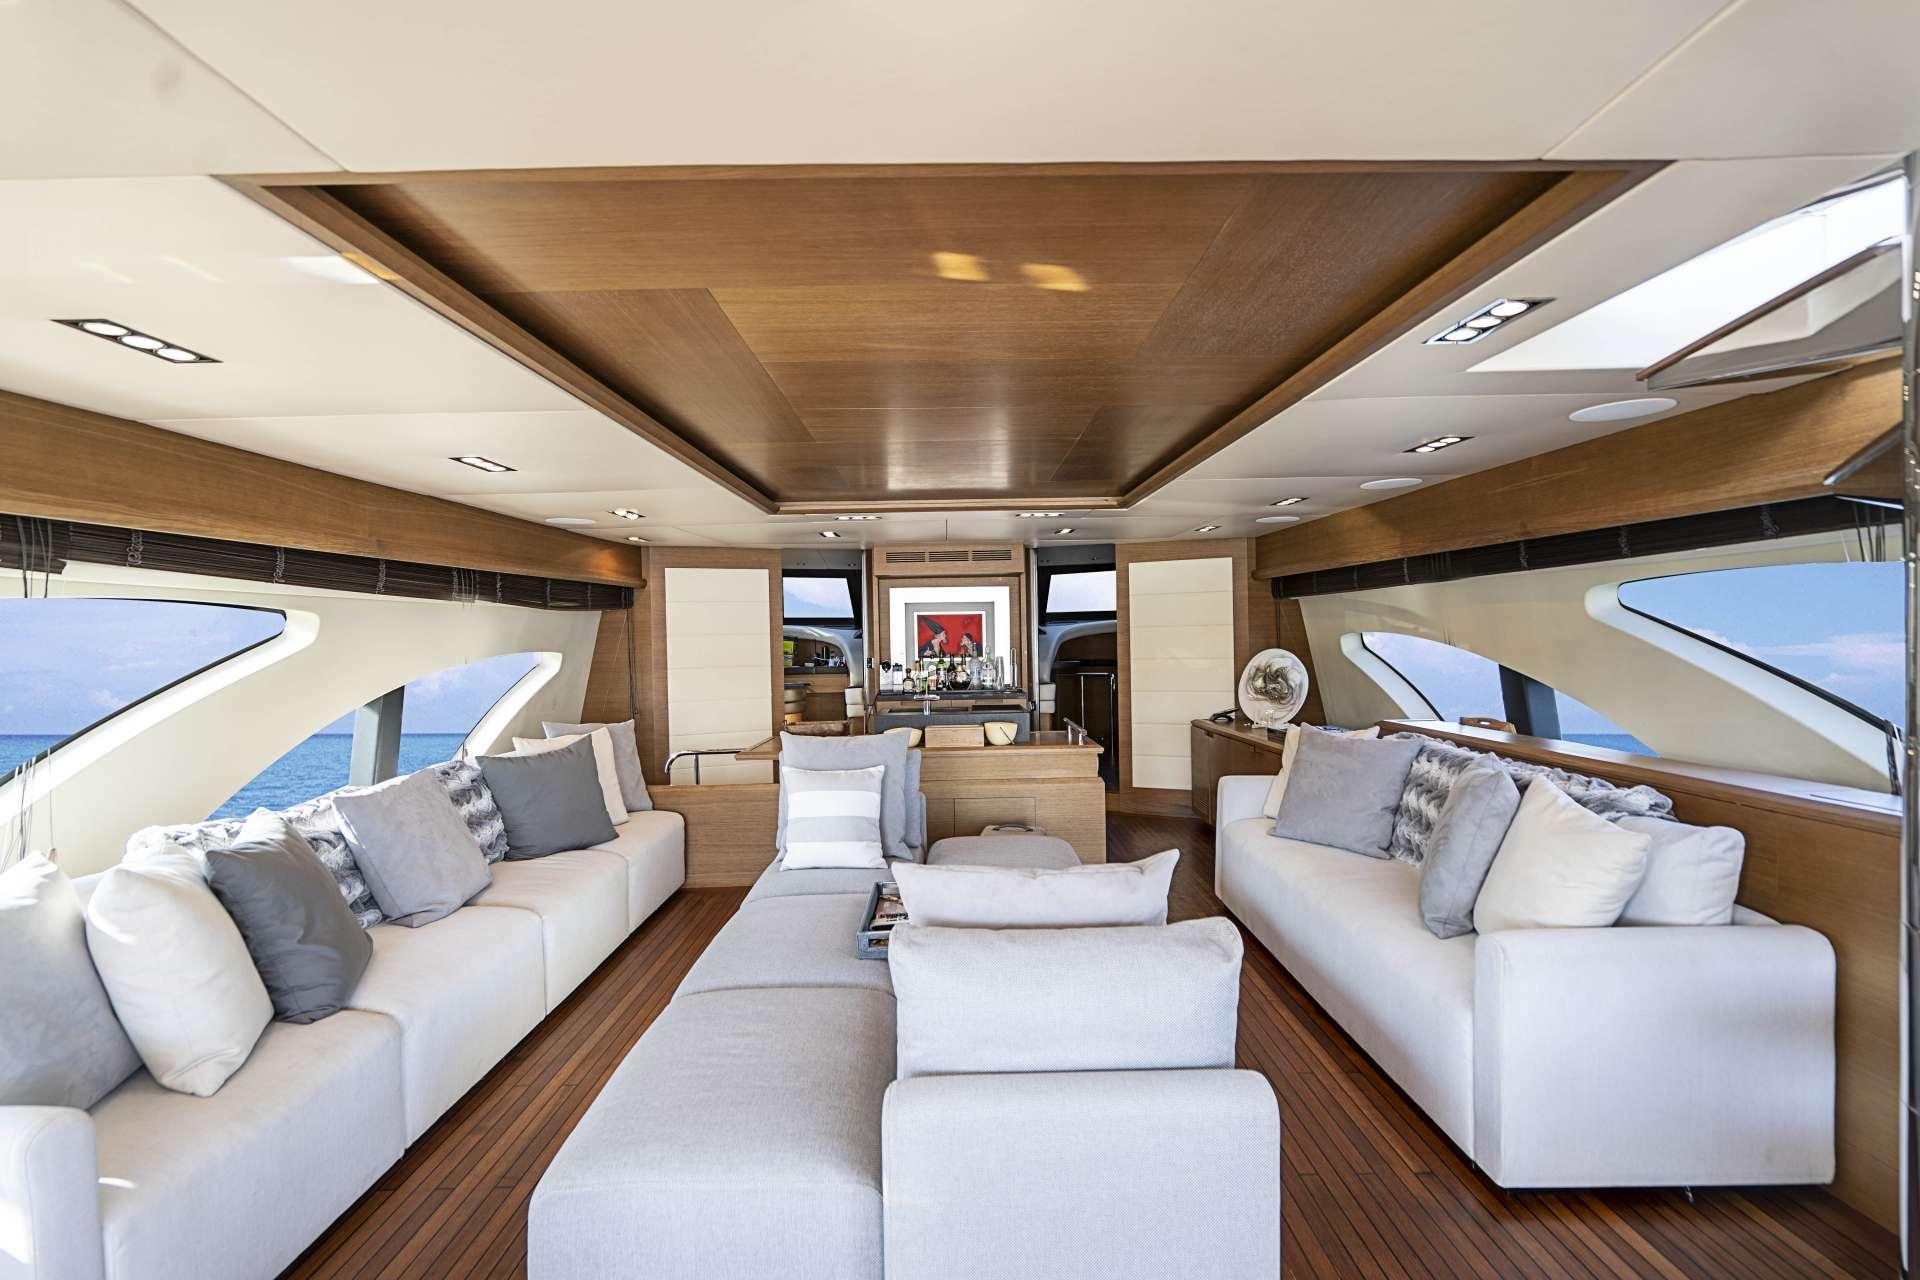 Power Yacht 'Power', 8 PAX, 5 Crew, 100.00 Ft, 30.49 Meters, Built 2010, Azimut, Refit Year 2016